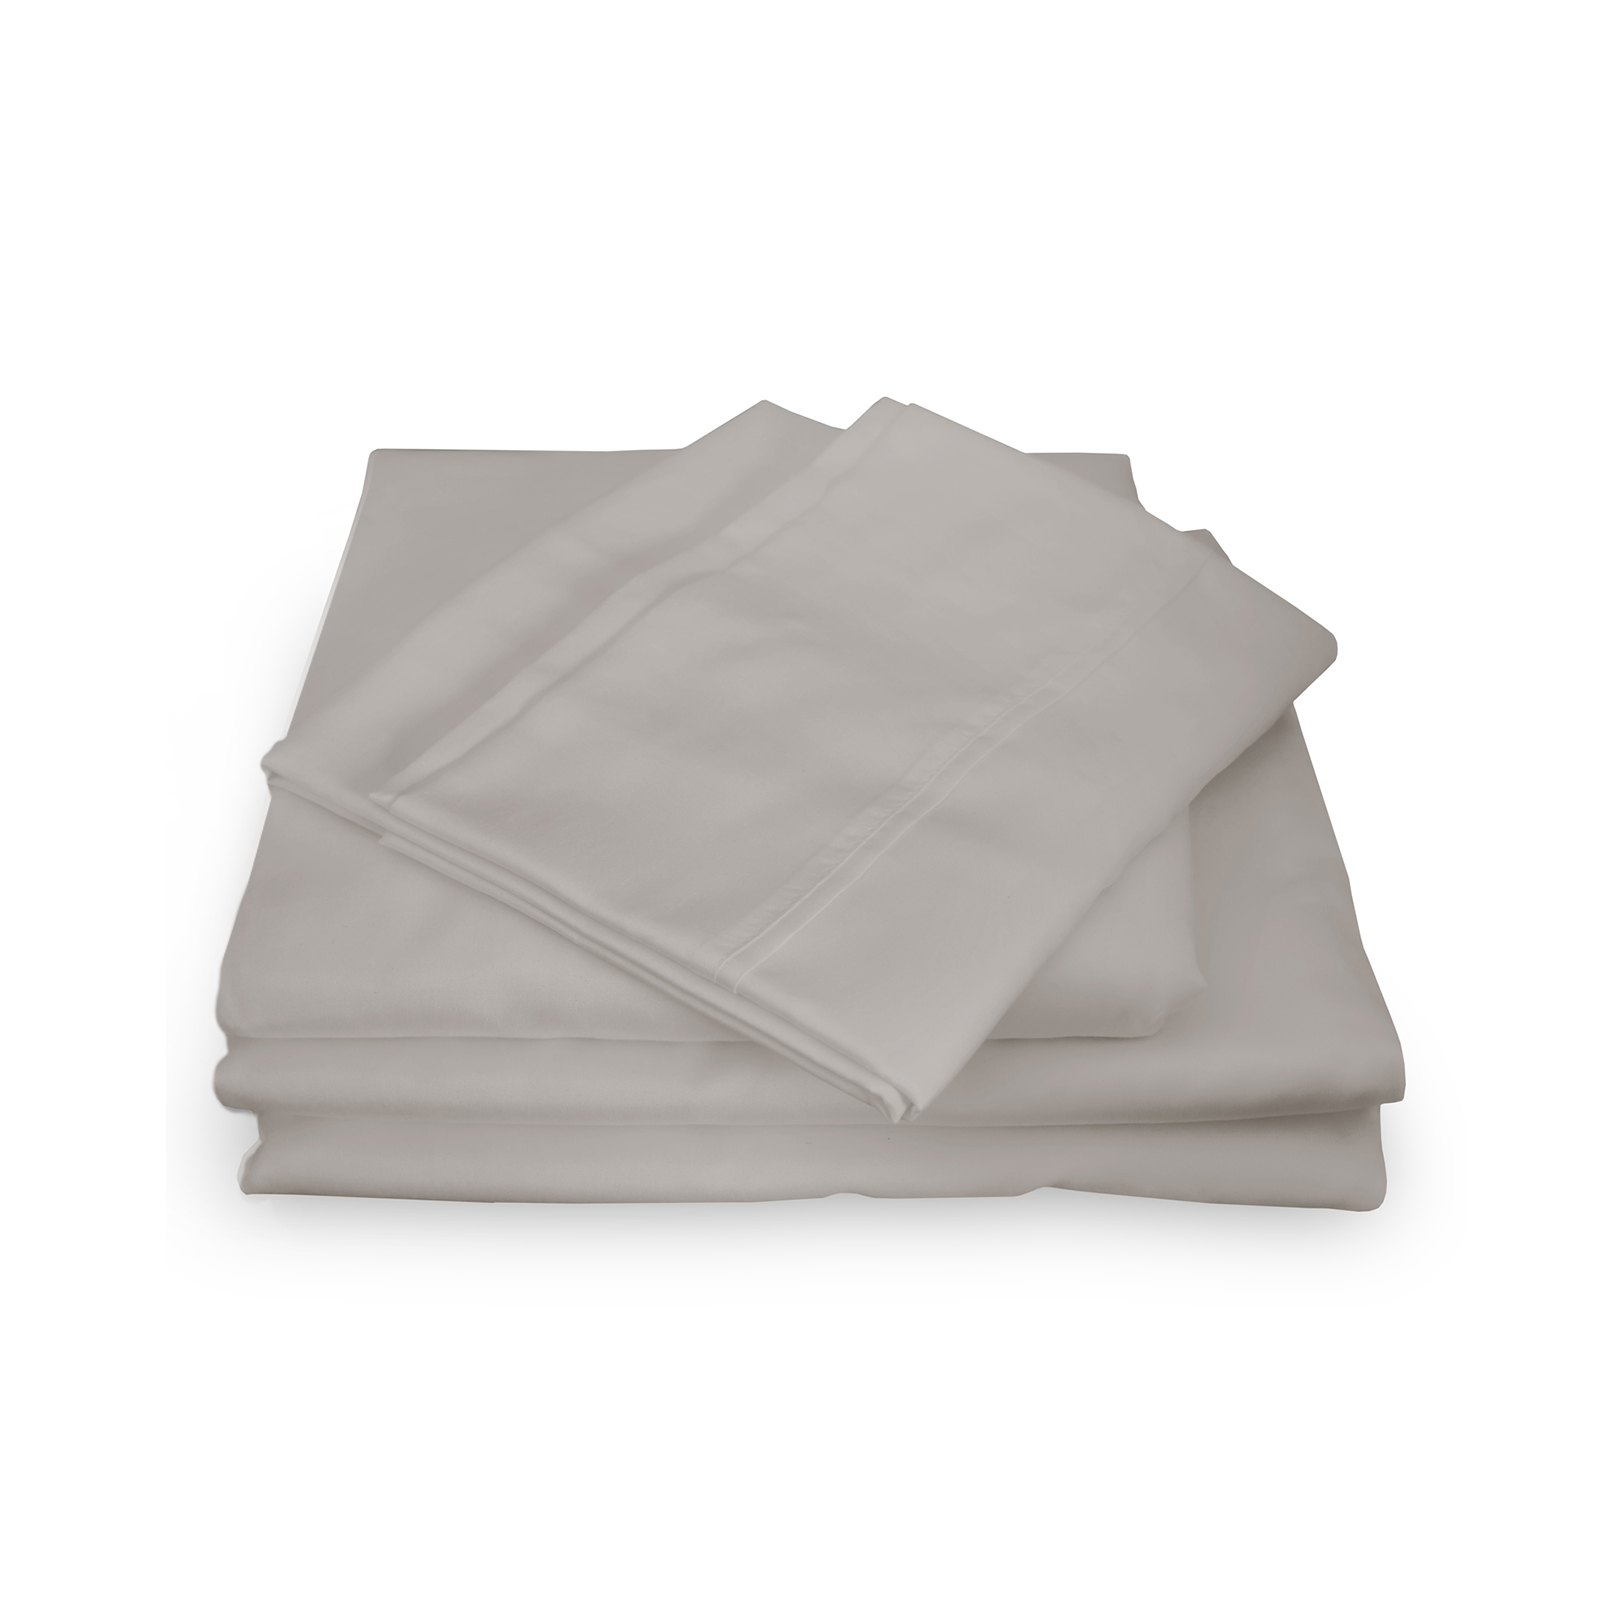 thumbnail 52 - Royal Comfort 1000TC Hotel Grade Bamboo Cotton Sheets Pillowcases Set Ultrasoft